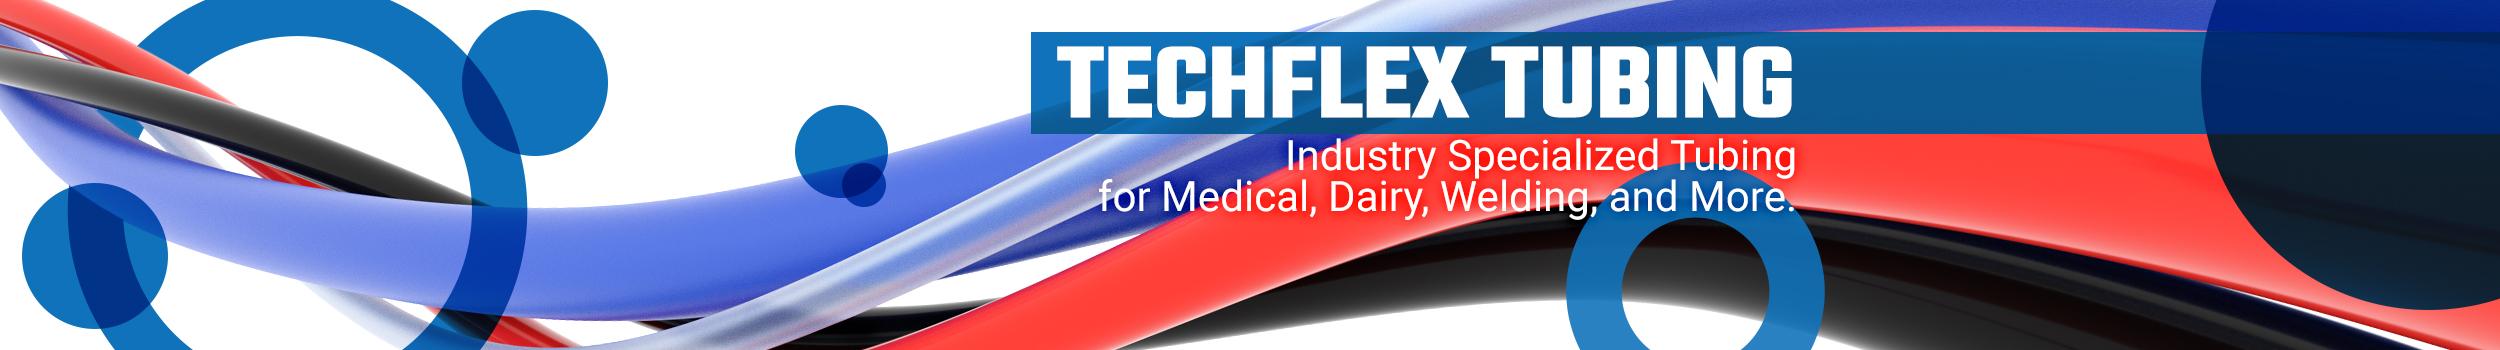 Techflex tubing banner